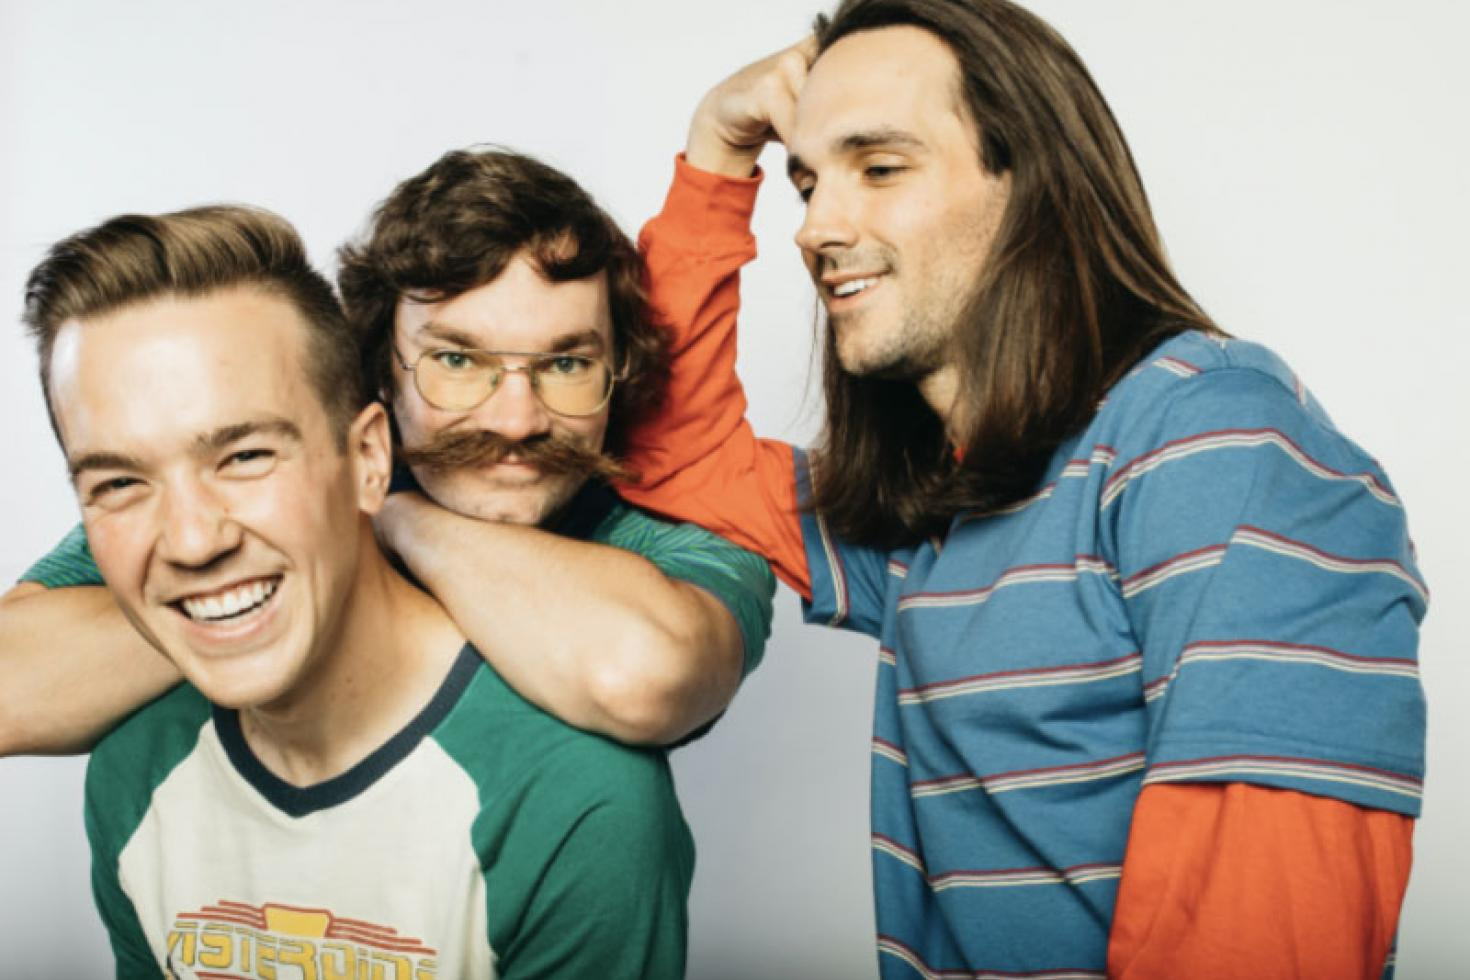 Tiny Moving Parts share new single 'Vertebrae'